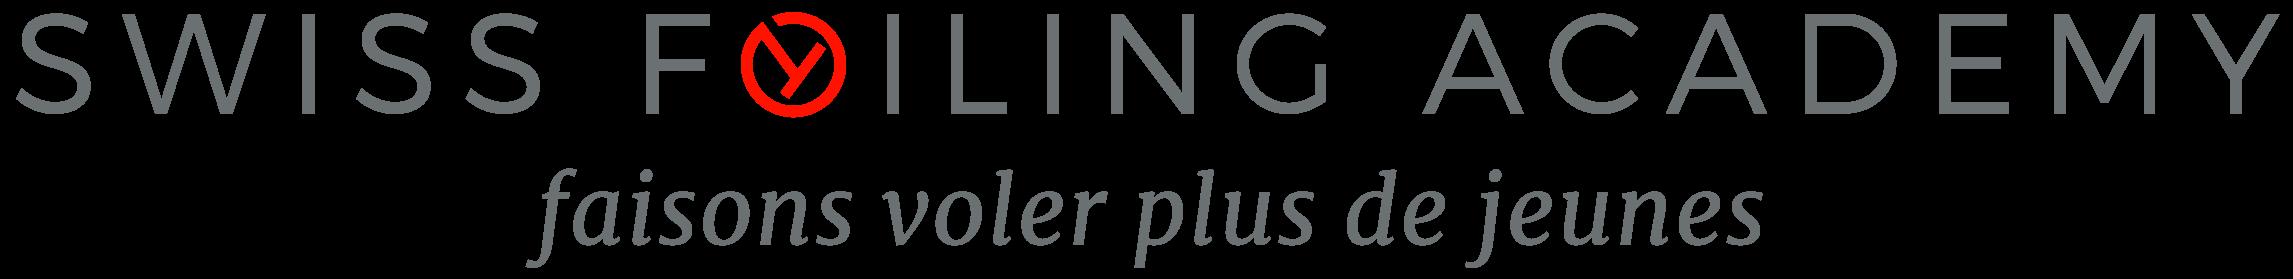 Swiss Foiling Academy